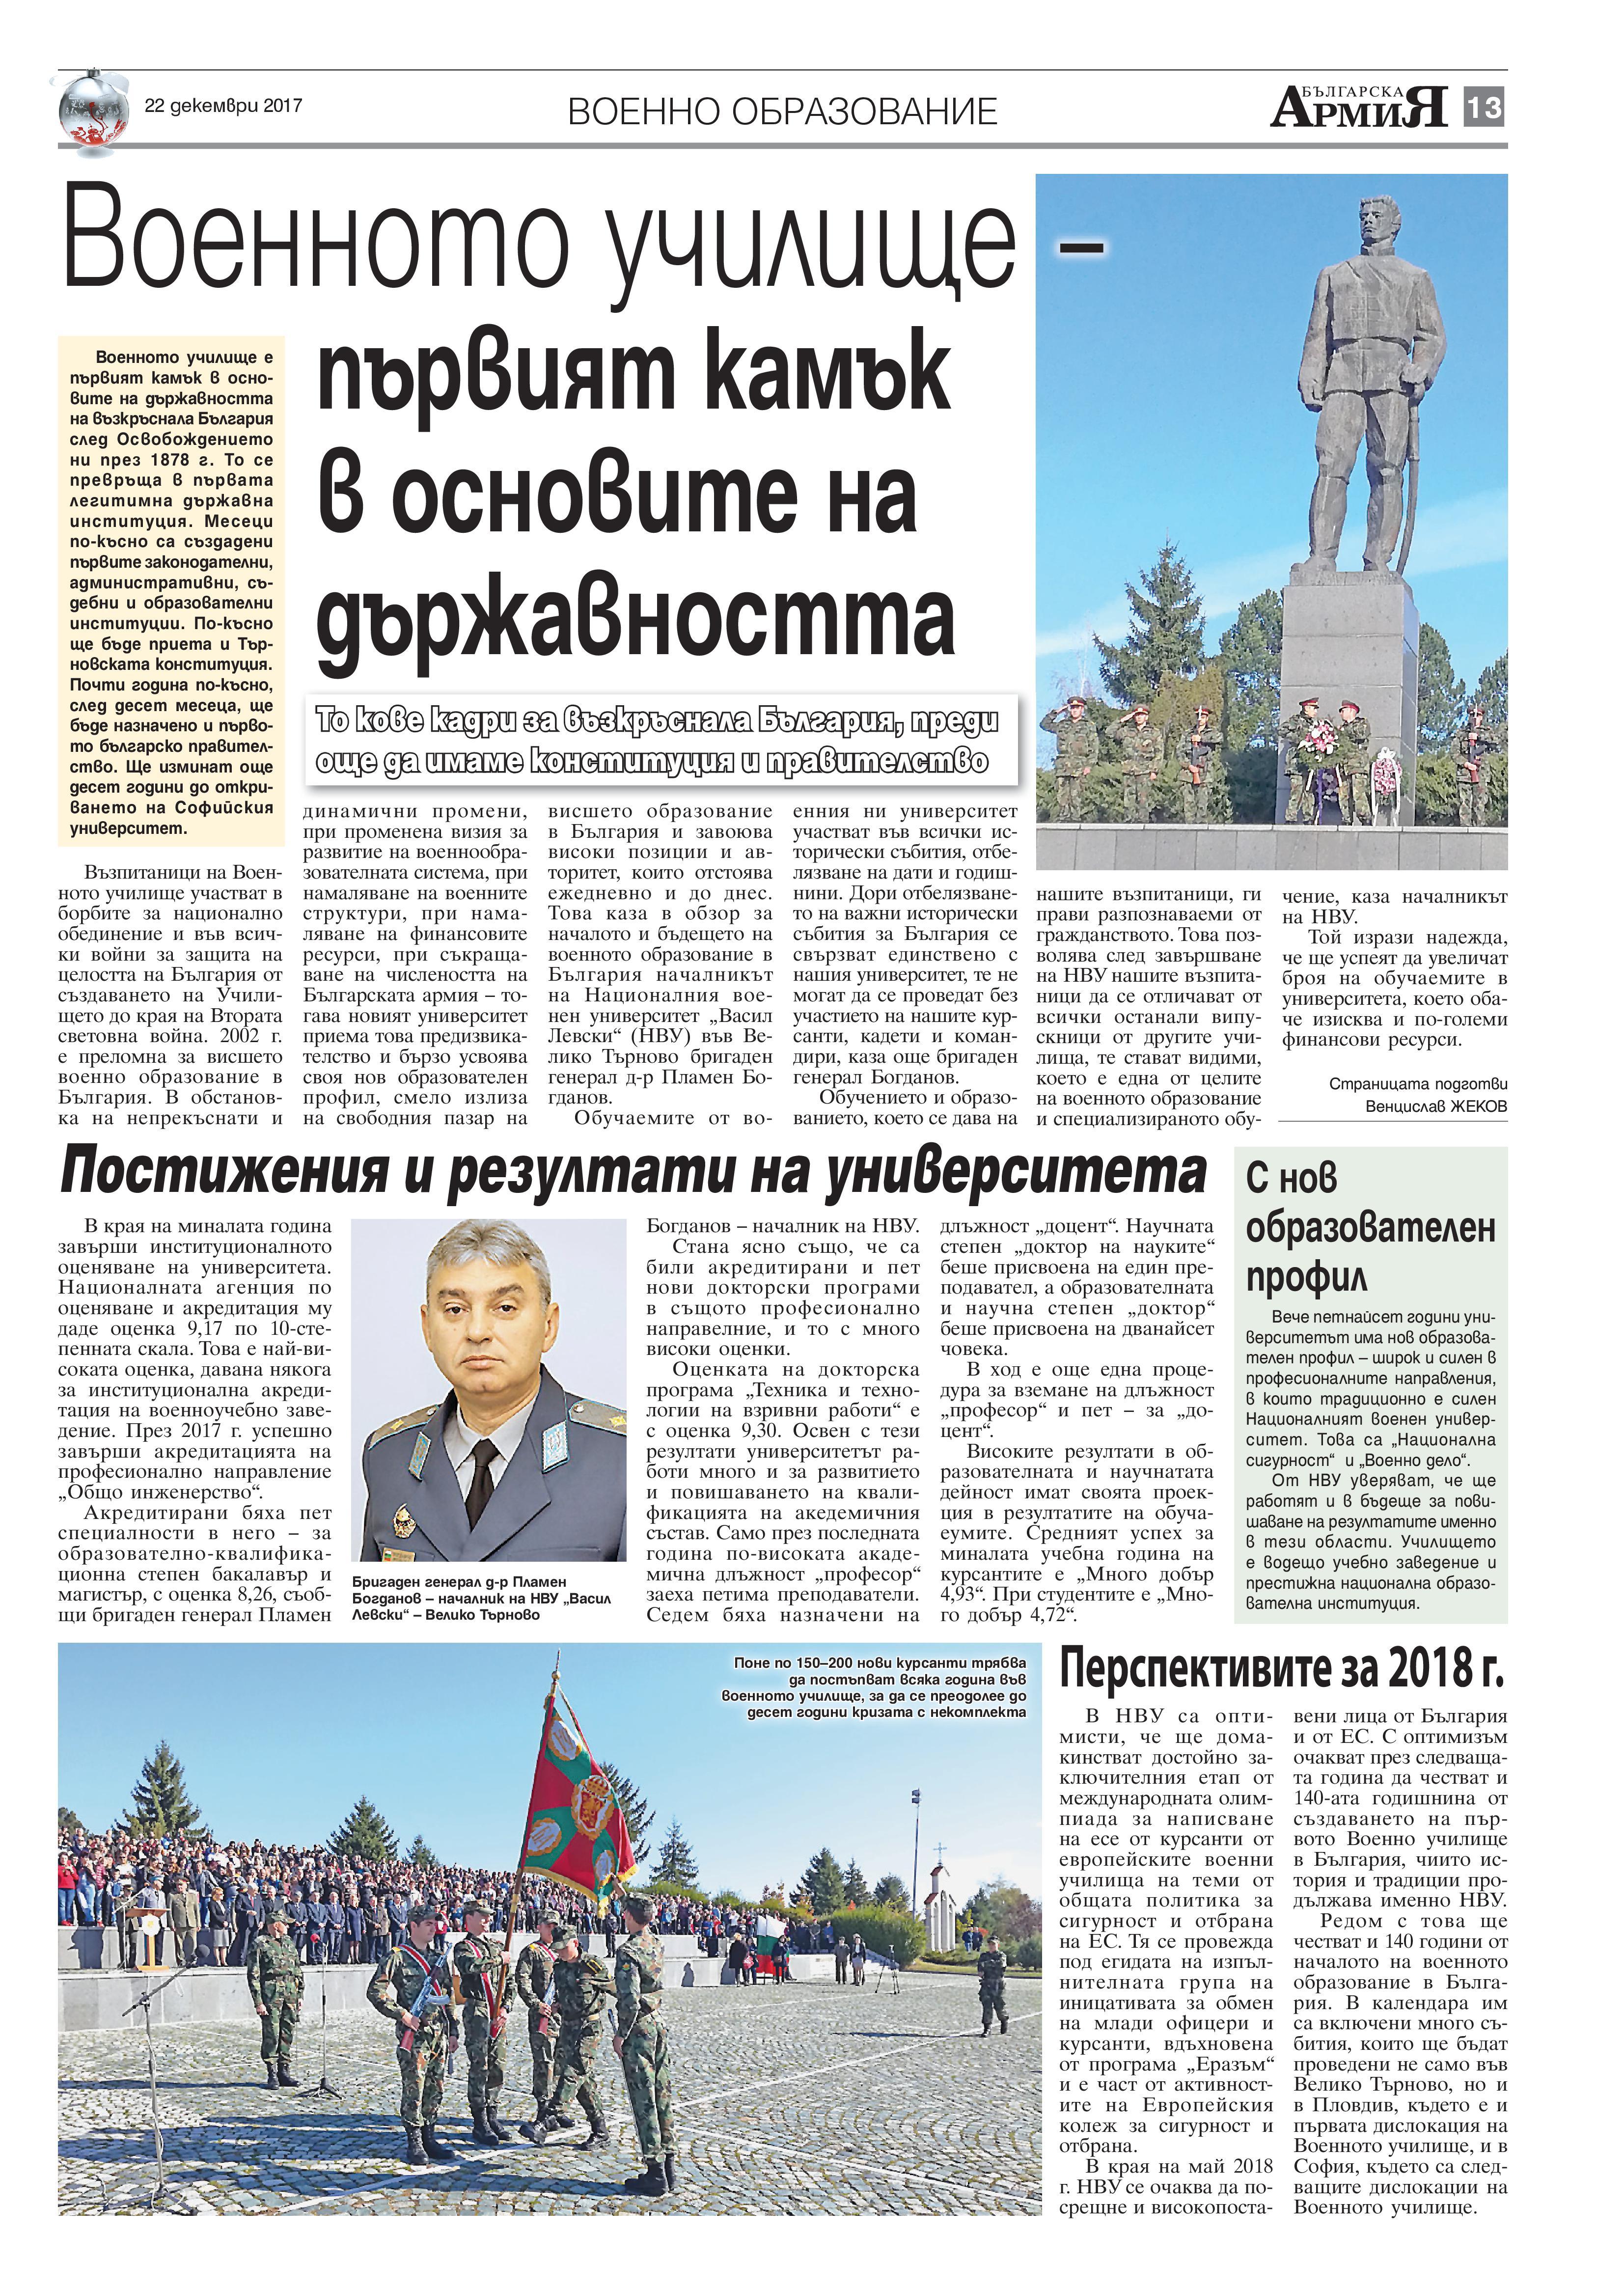 http://armymedia.bg/wp-content/uploads/2015/06/13-16.jpg